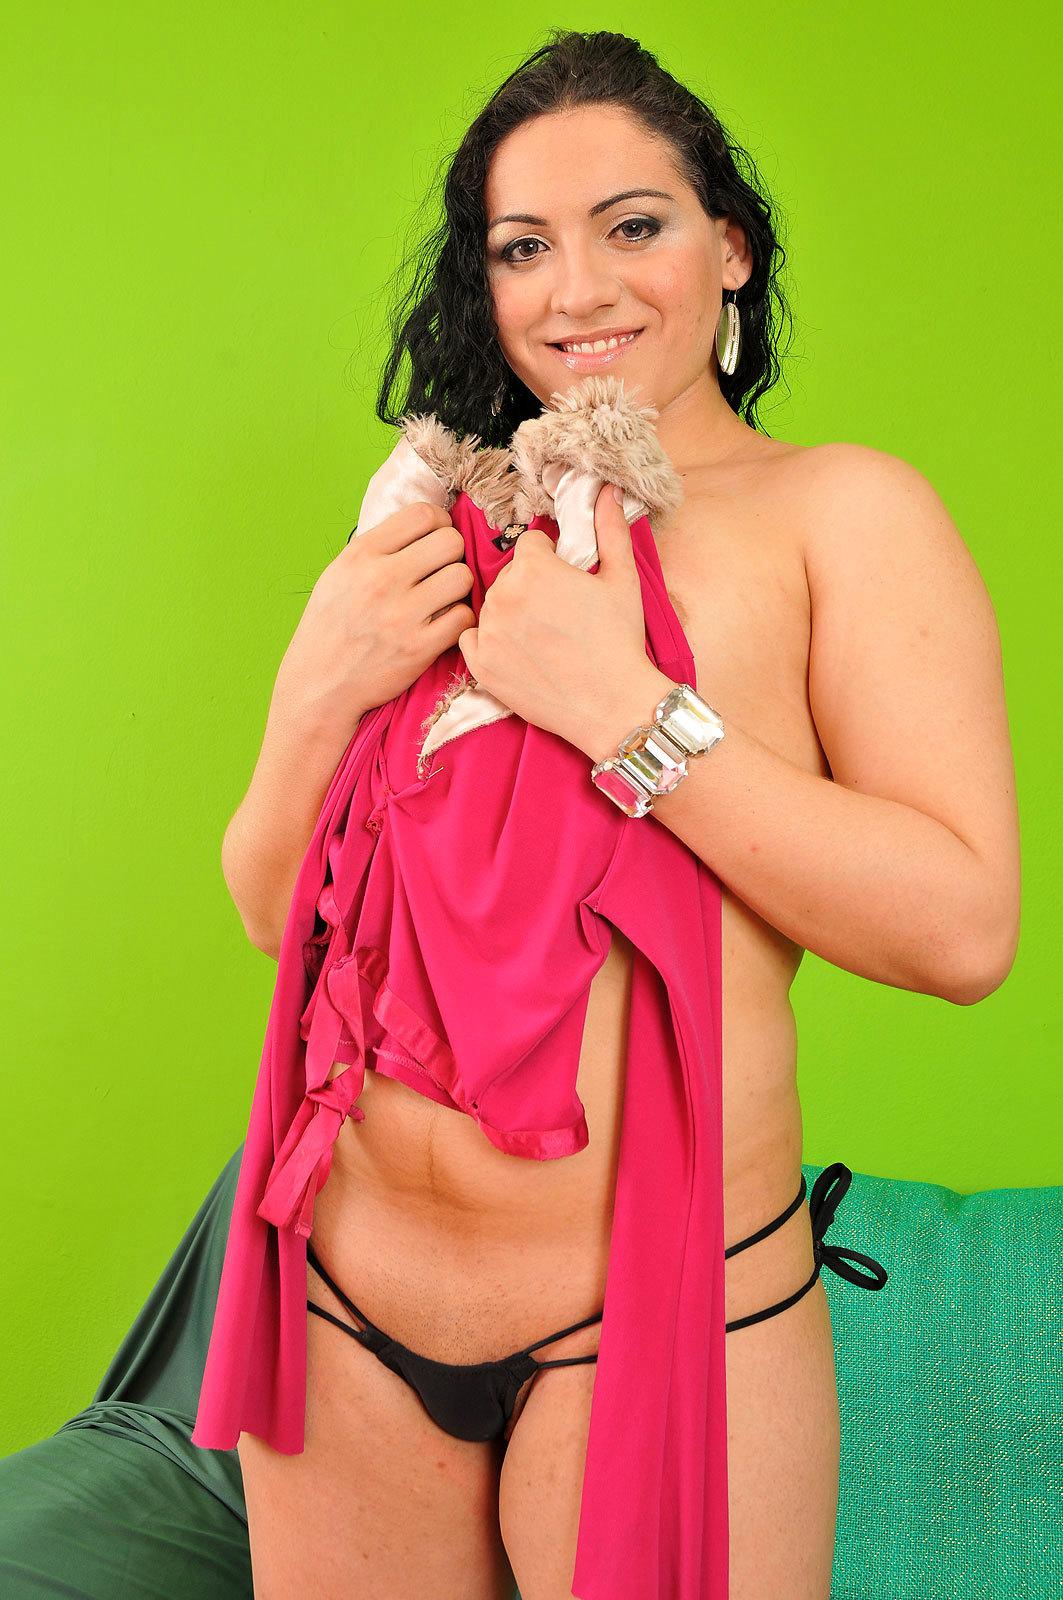 Yummy Brunette Tranny Raissa Sampaio Strips Down Outfit